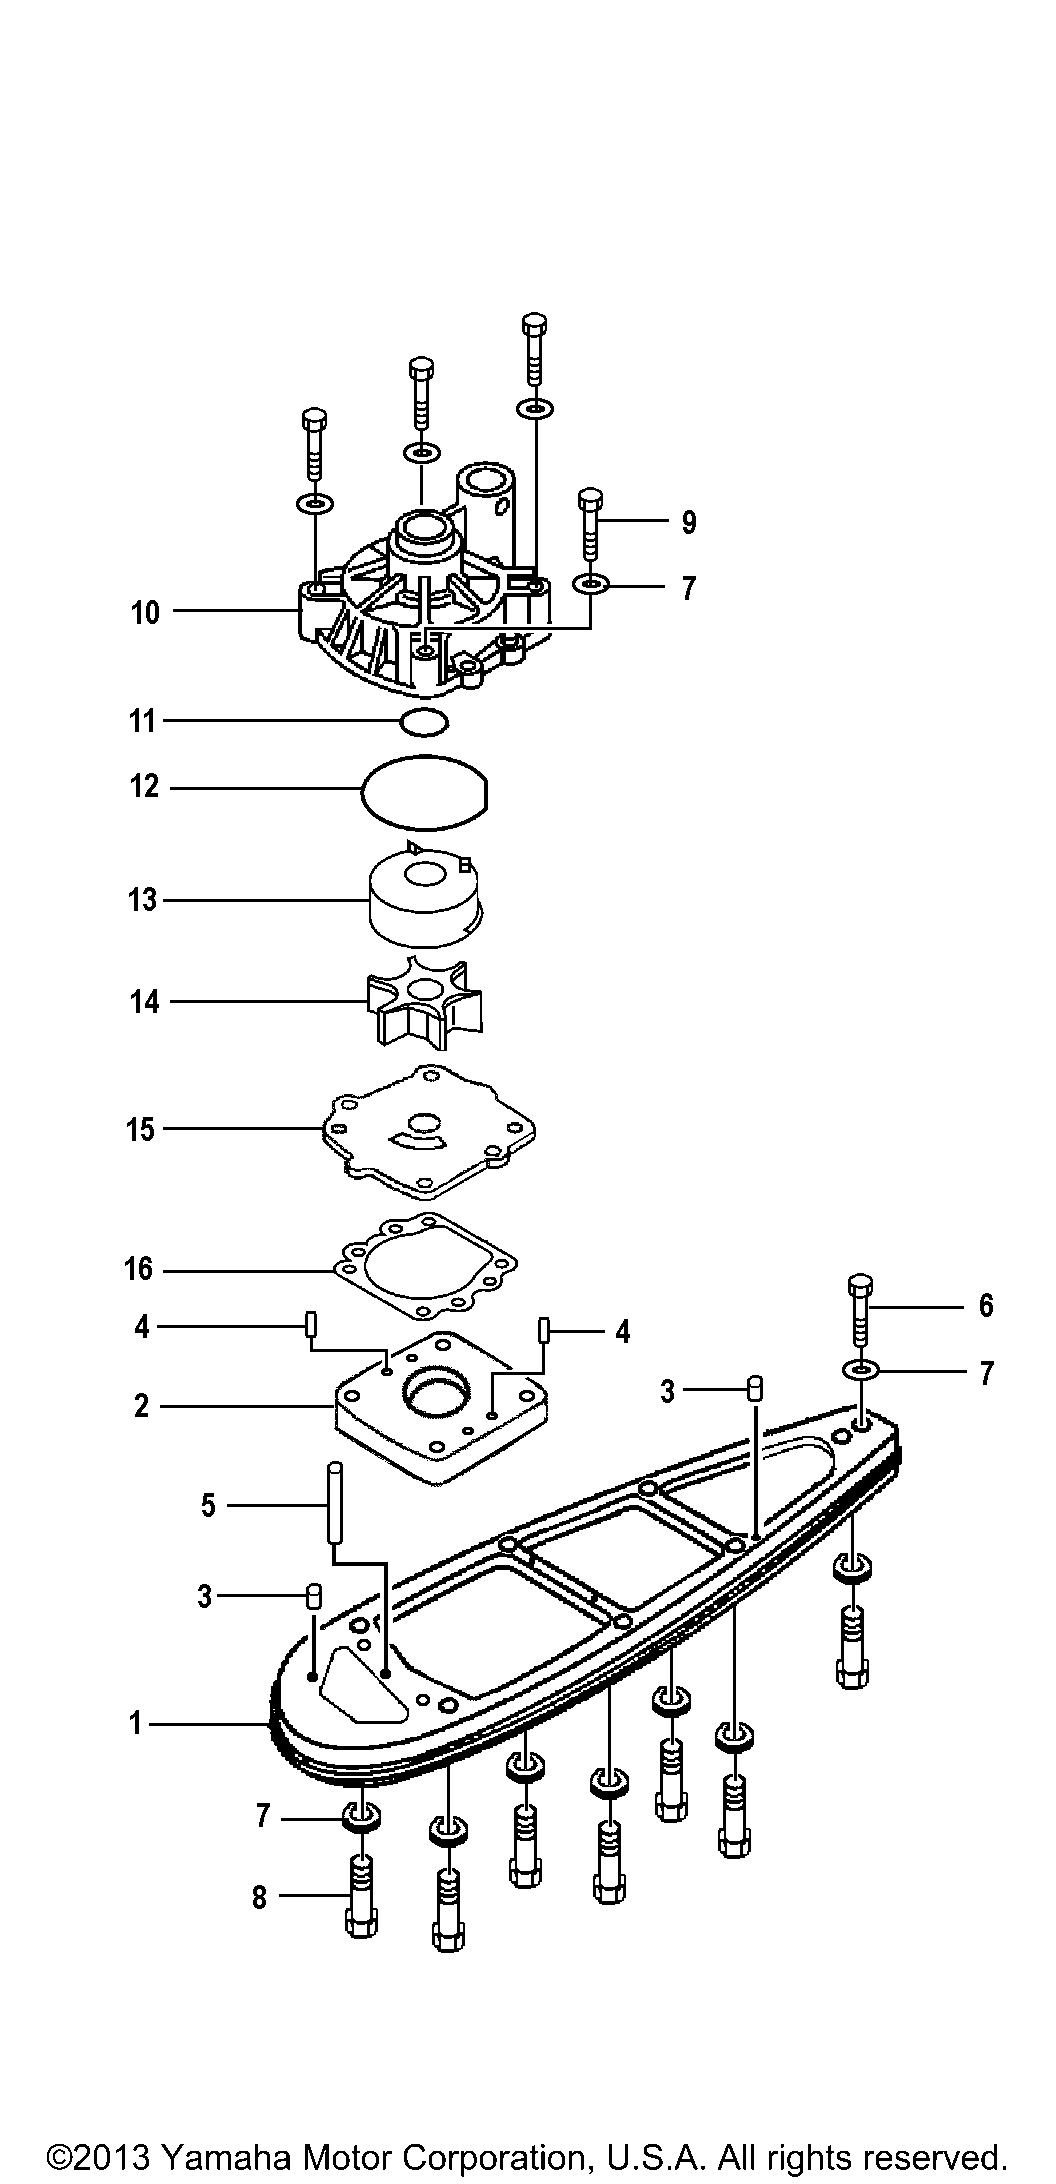 Yamaha F115 Hp Outboard Service Repair Manual